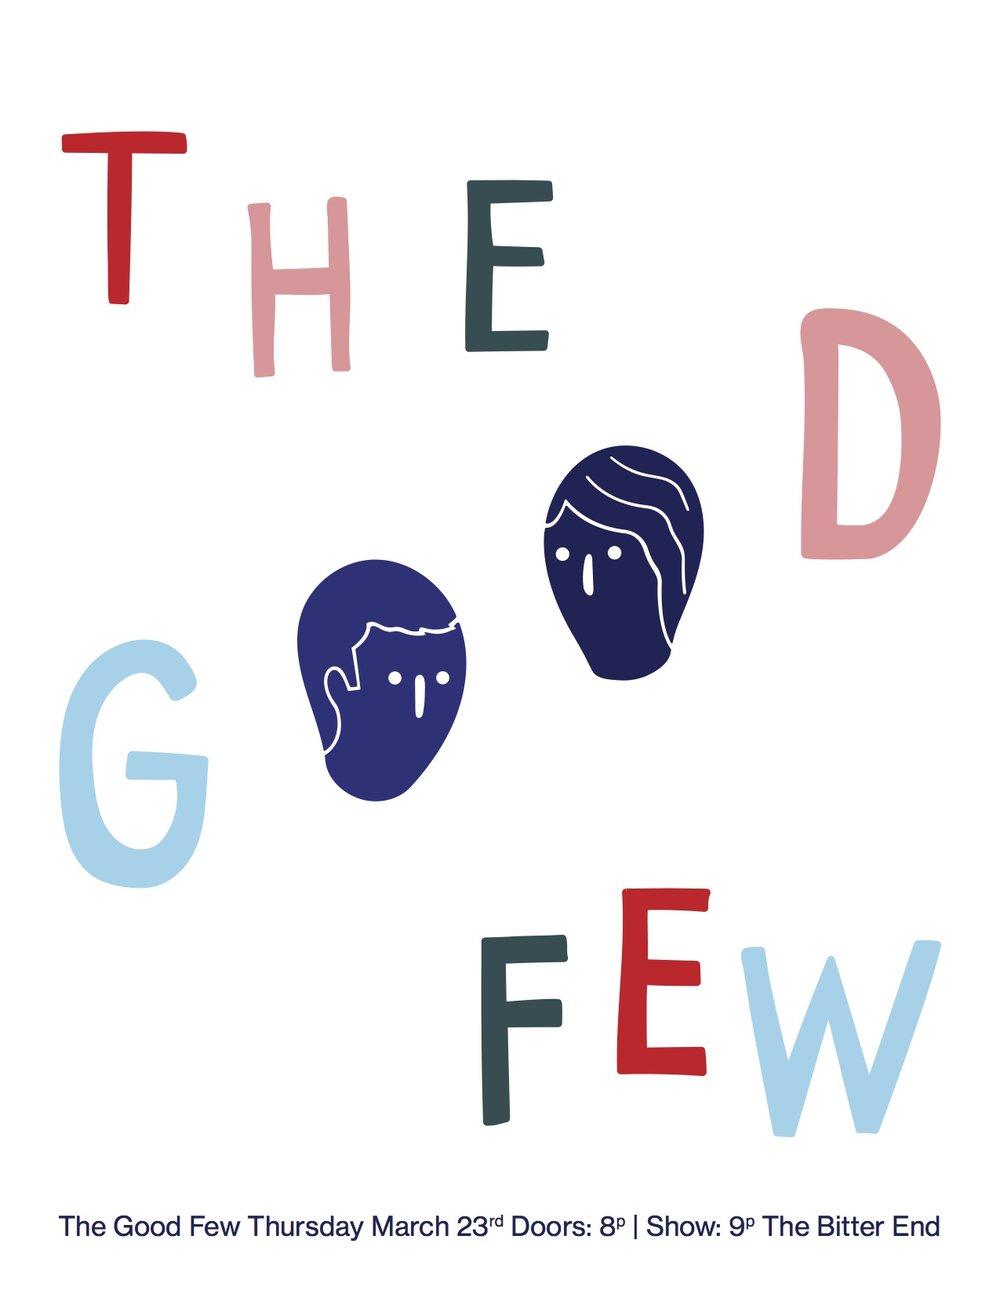 TGF_flyers.jpg